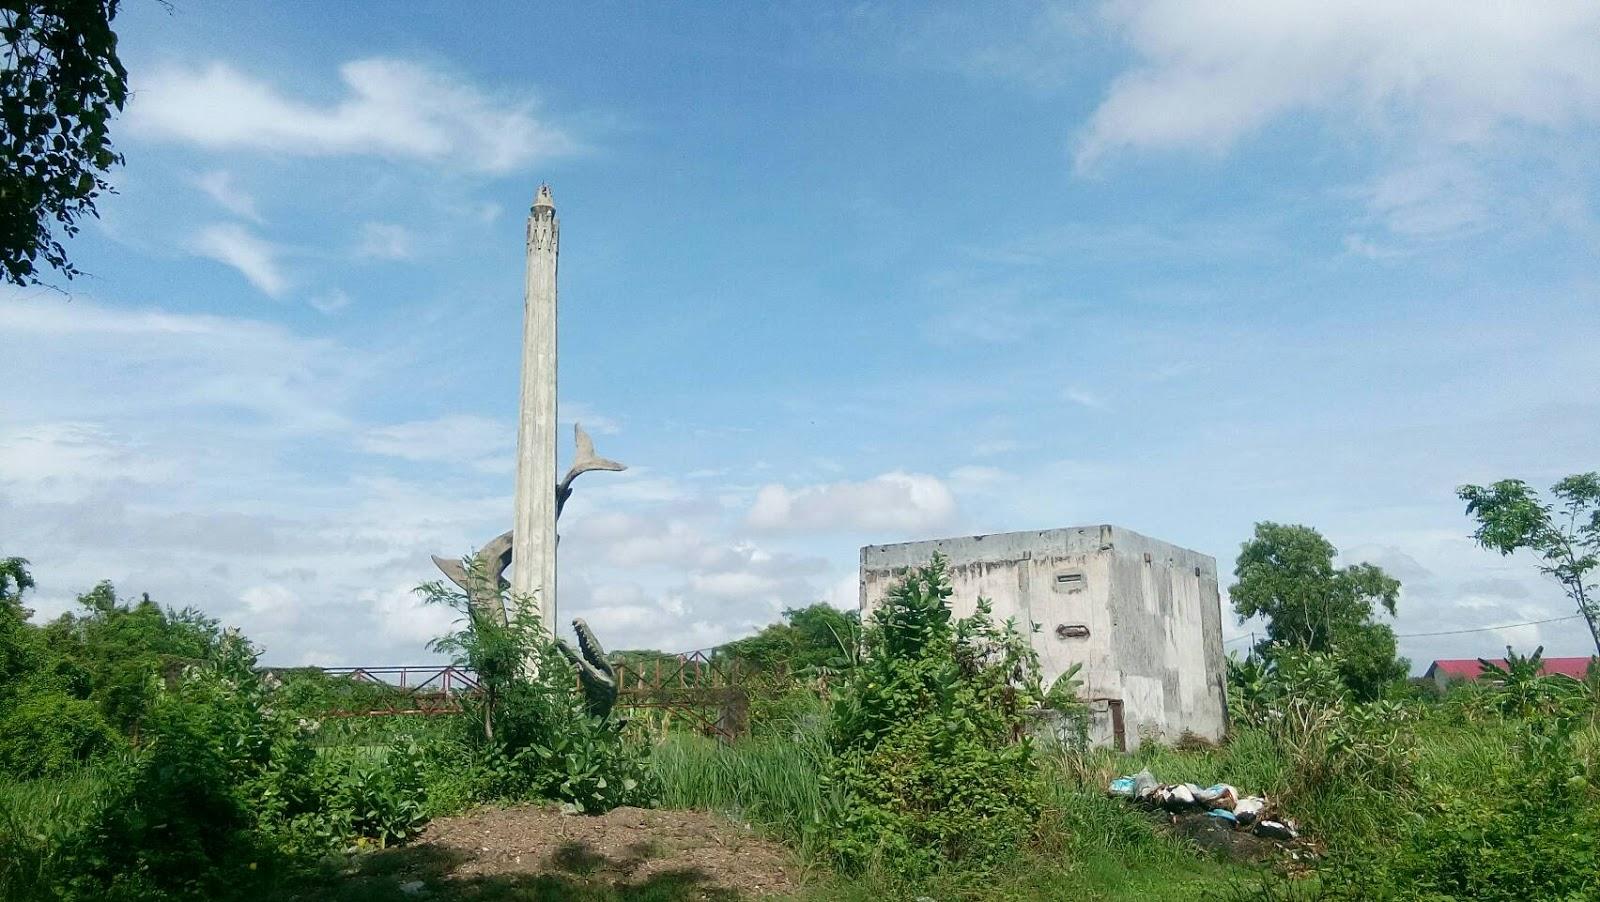 Patung Sura Baya Kenjeran Riwayatmu Kim Bahari Sukolilo Taman Kota